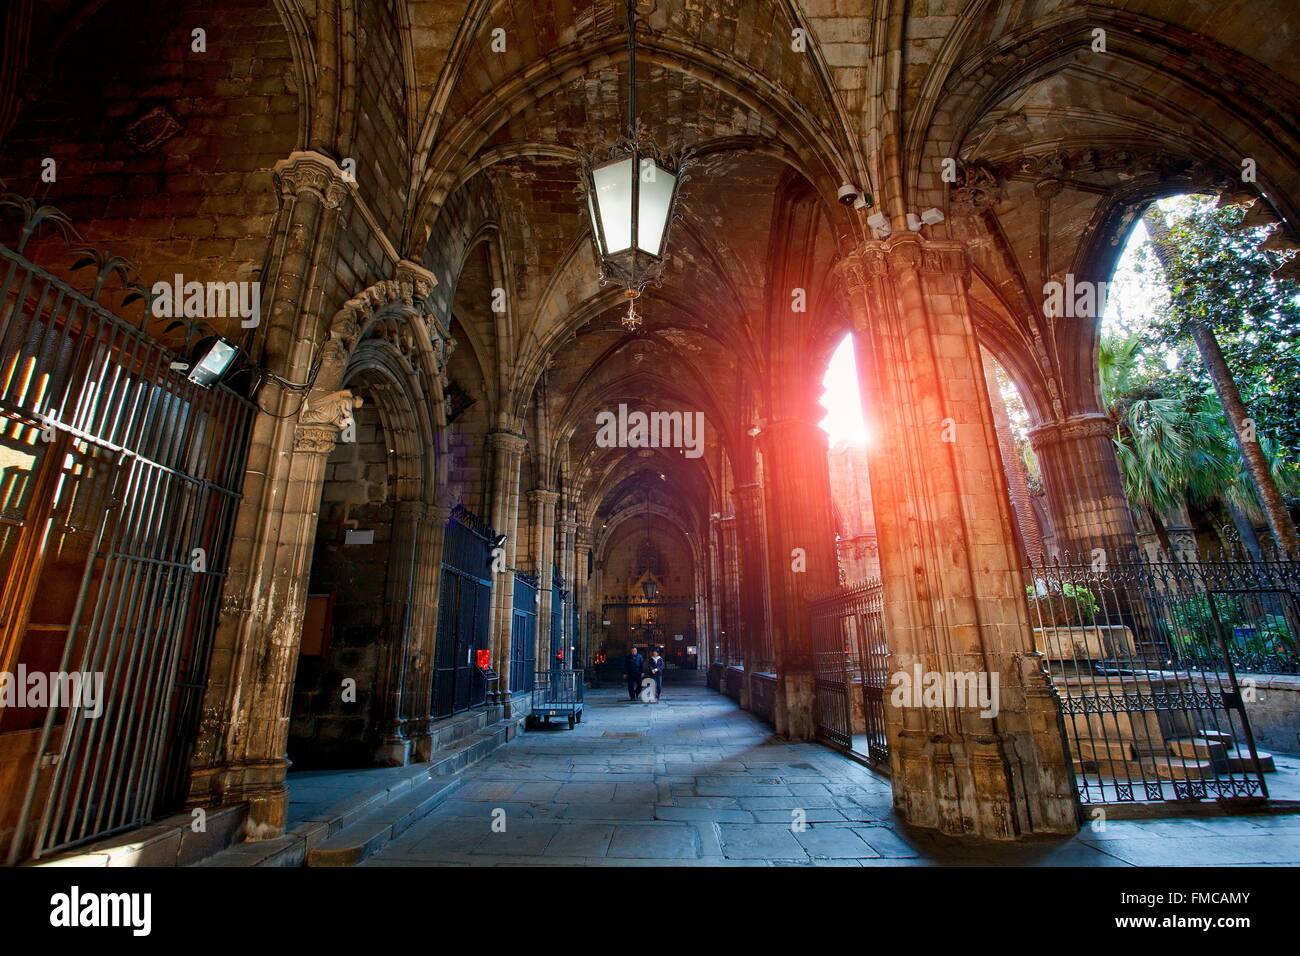 España, Cataluña, Barcelona, la Catedral de Barcelona Imagen De Stock